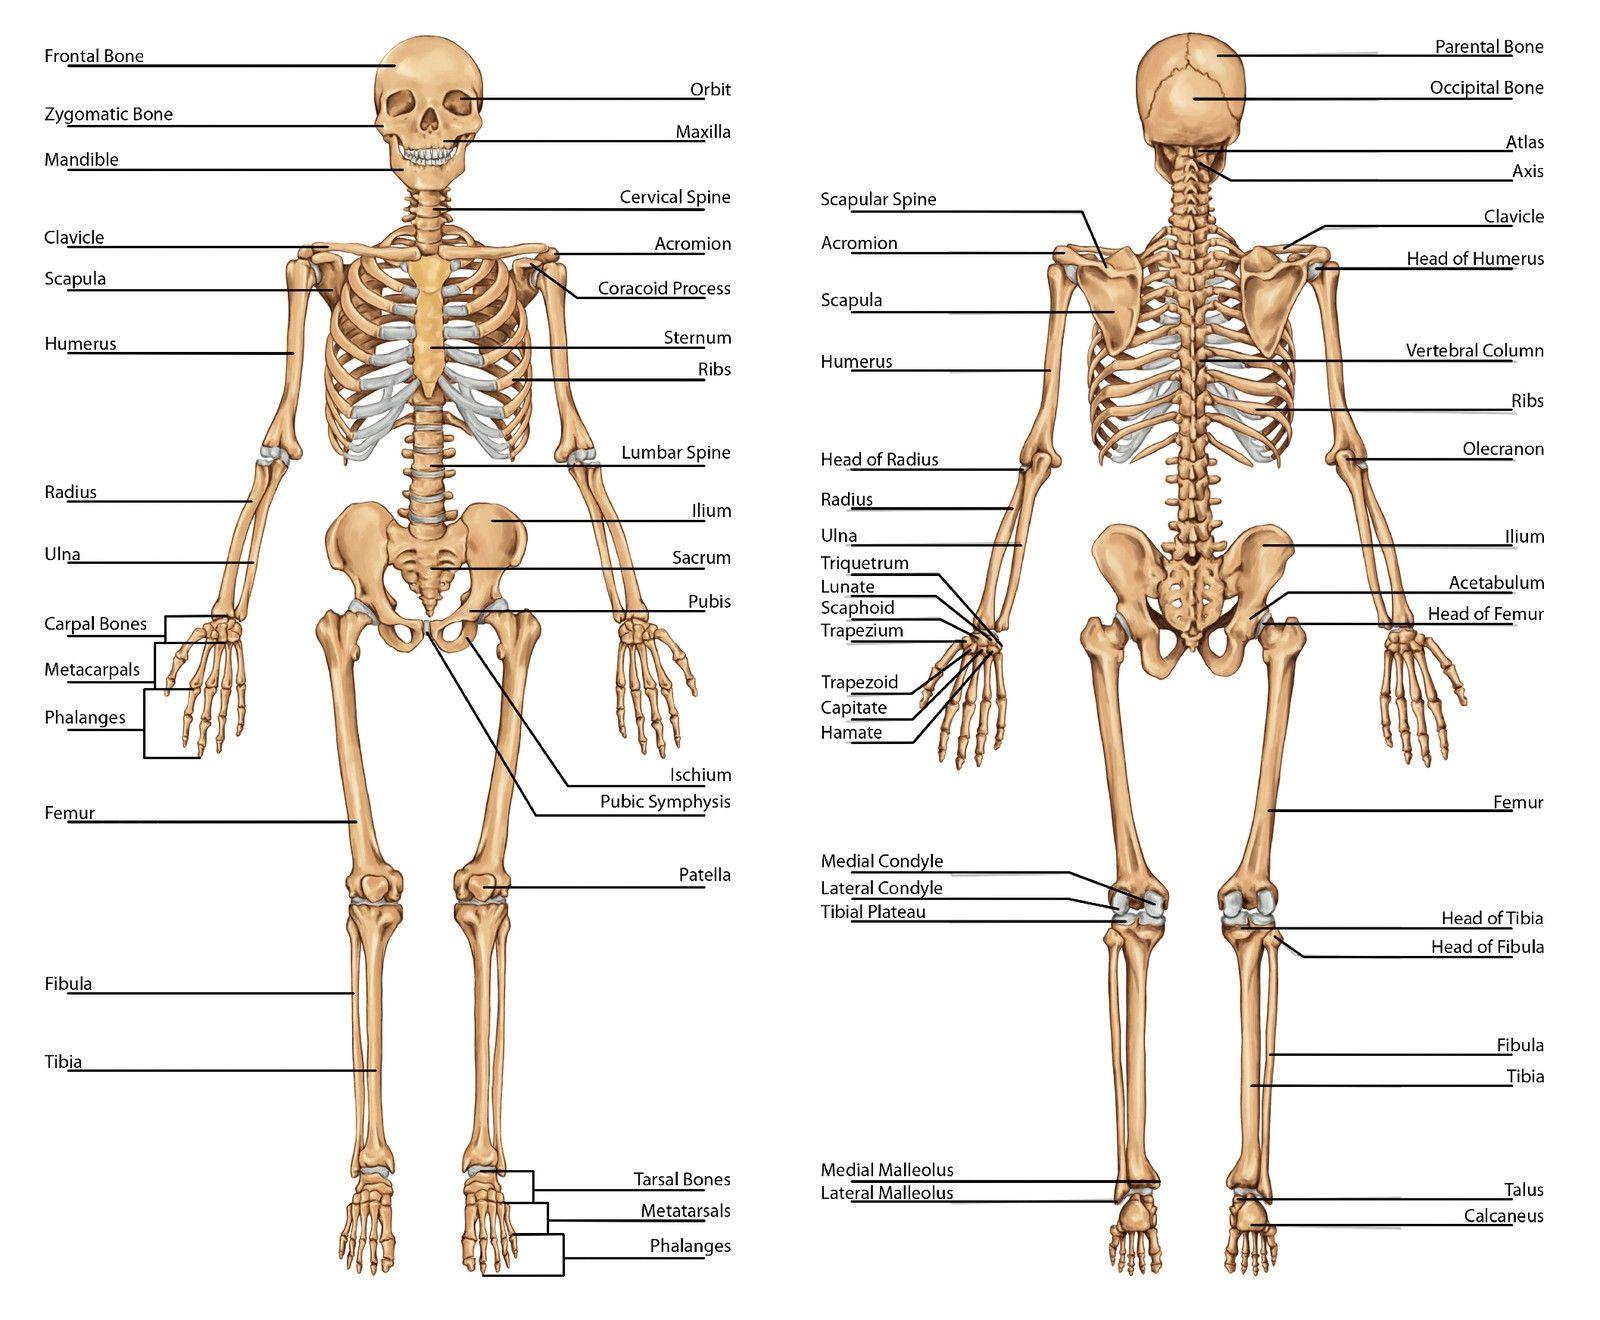 skeleton-bones-human-skeleton-anatomy-bones-diagram-human-anatomy ...